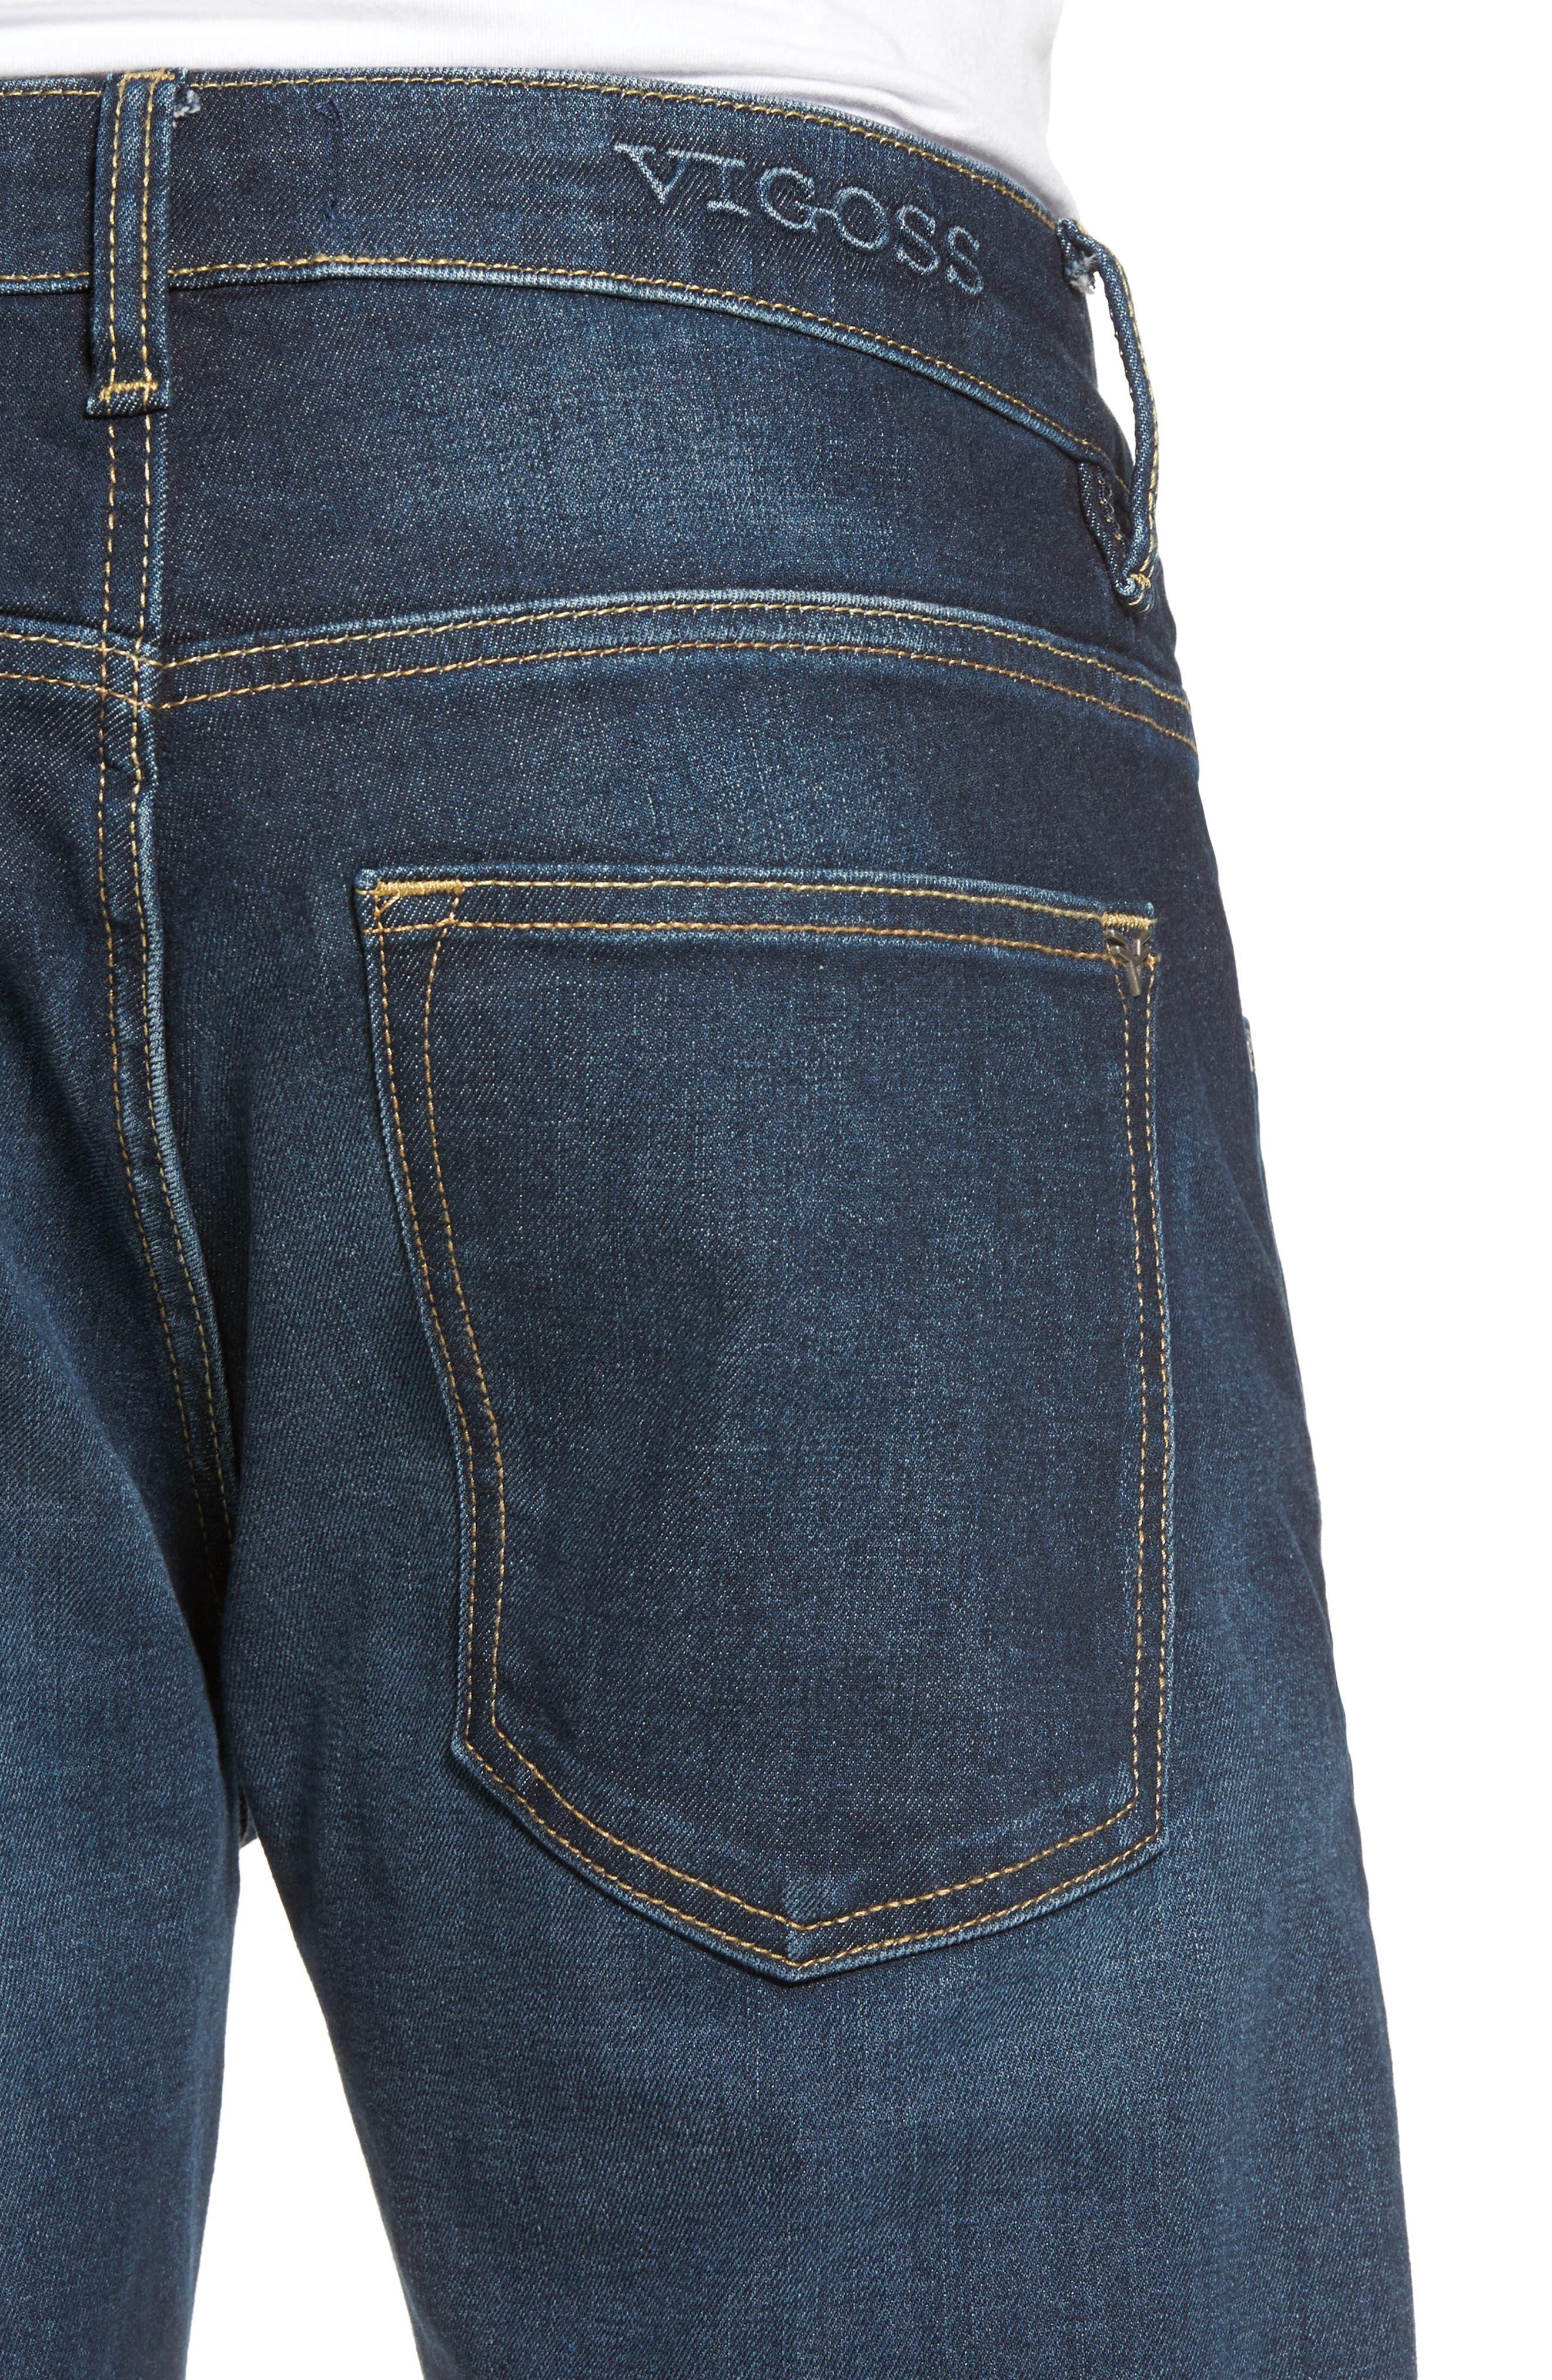 Slim Straight Leg Jeans,                             Alternate thumbnail 4, color,                             400